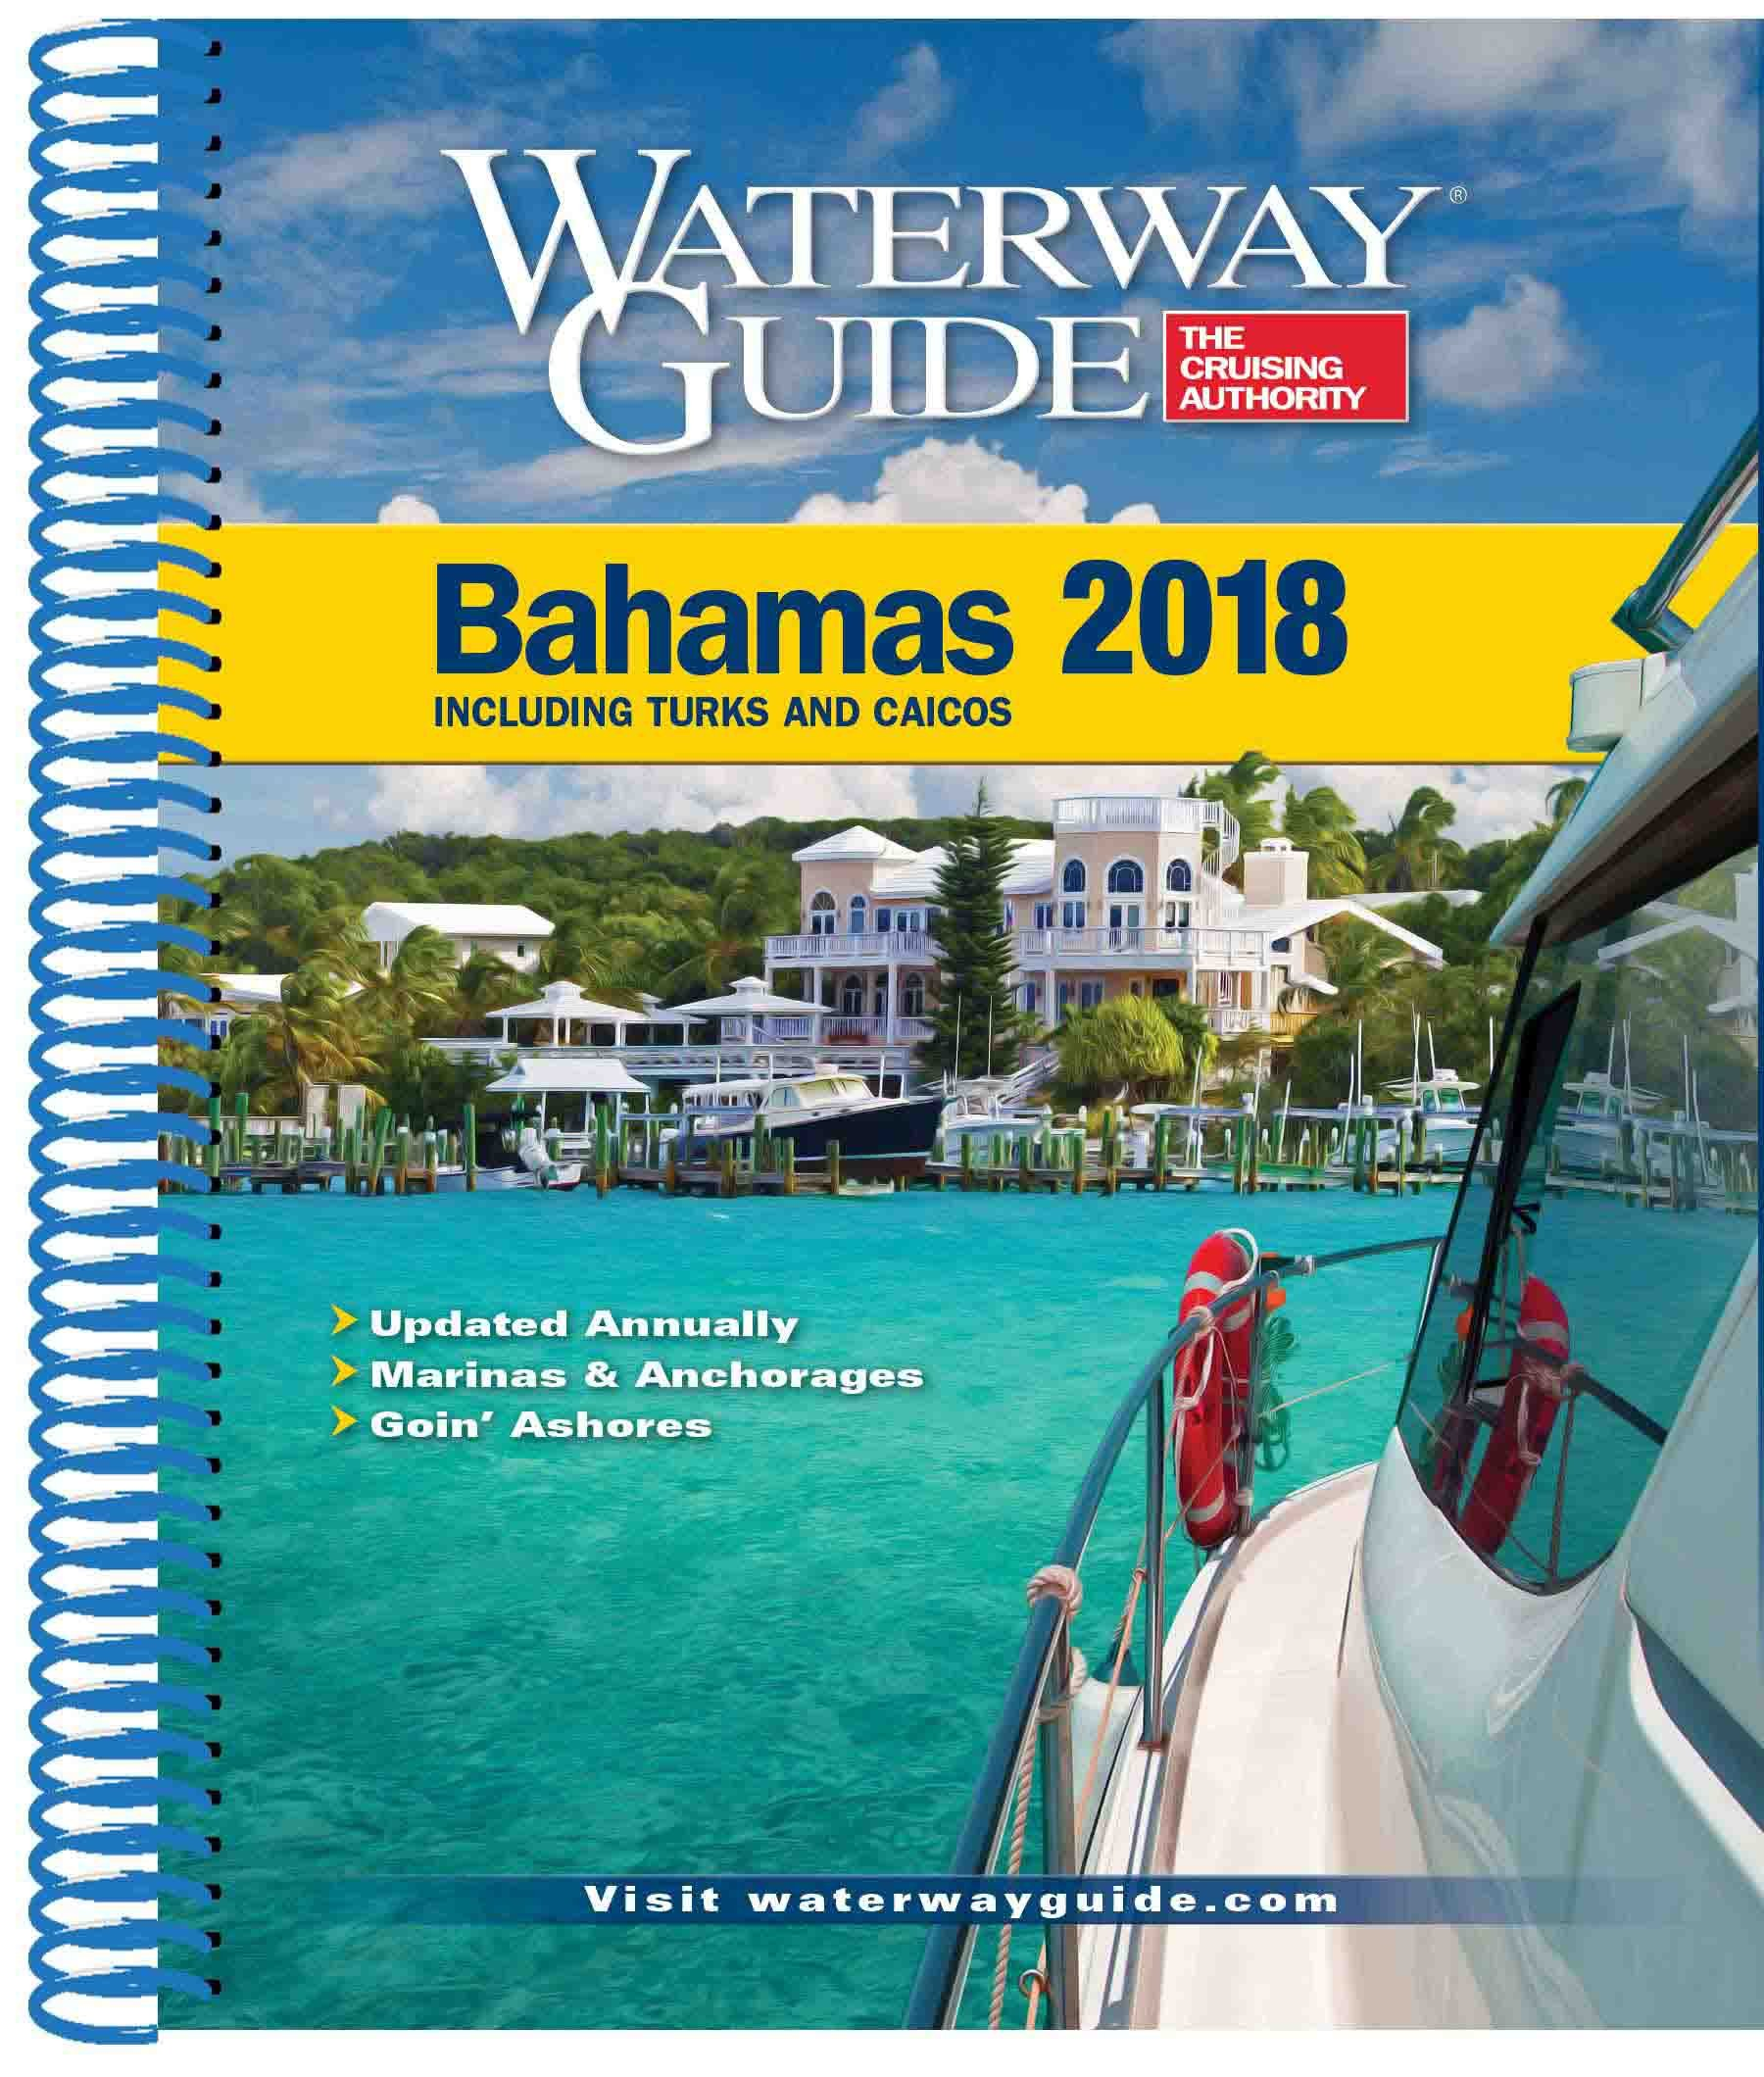 Waterway Guide the Bahamas 2018 (Waterway Guide. Bahamas) PDF